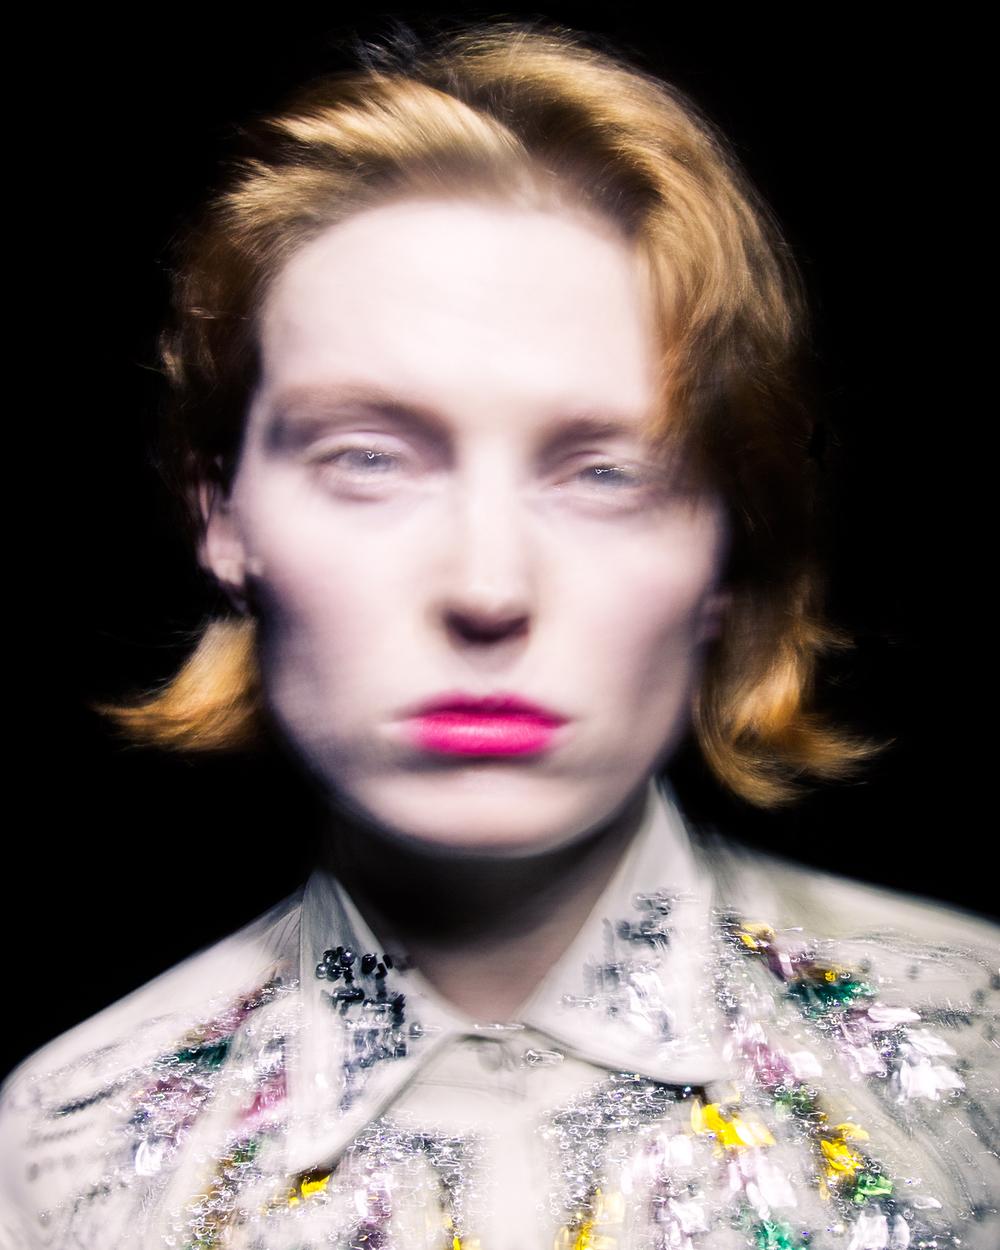 Mariana-Hahn-shimmer-portrait-Matthew-Coleman-Photography